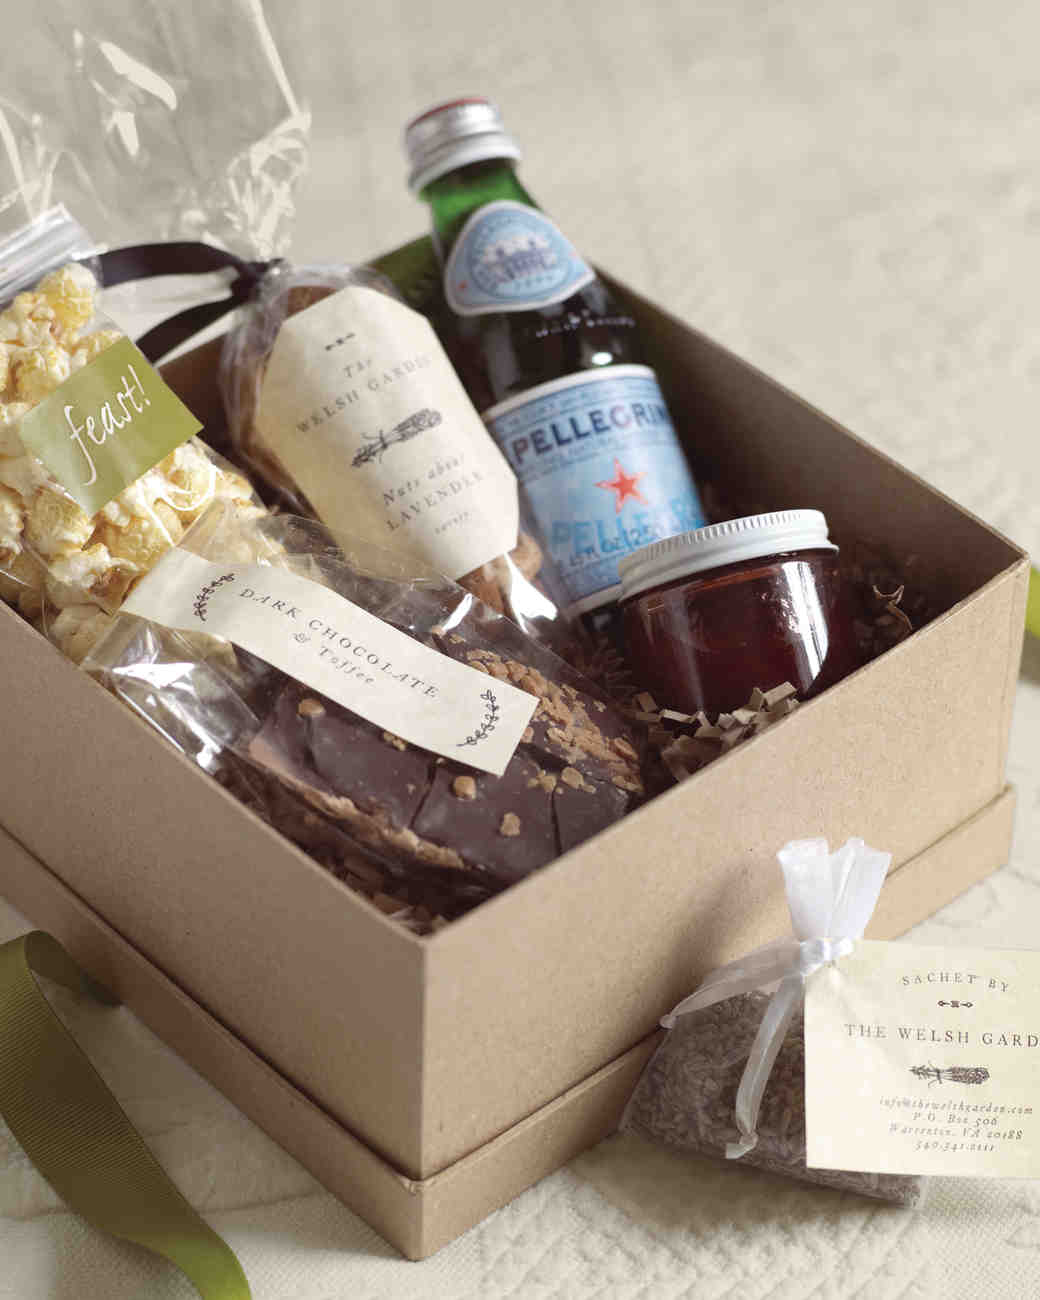 kennedy-gregory-gift-box-009-mwd108943.jpg